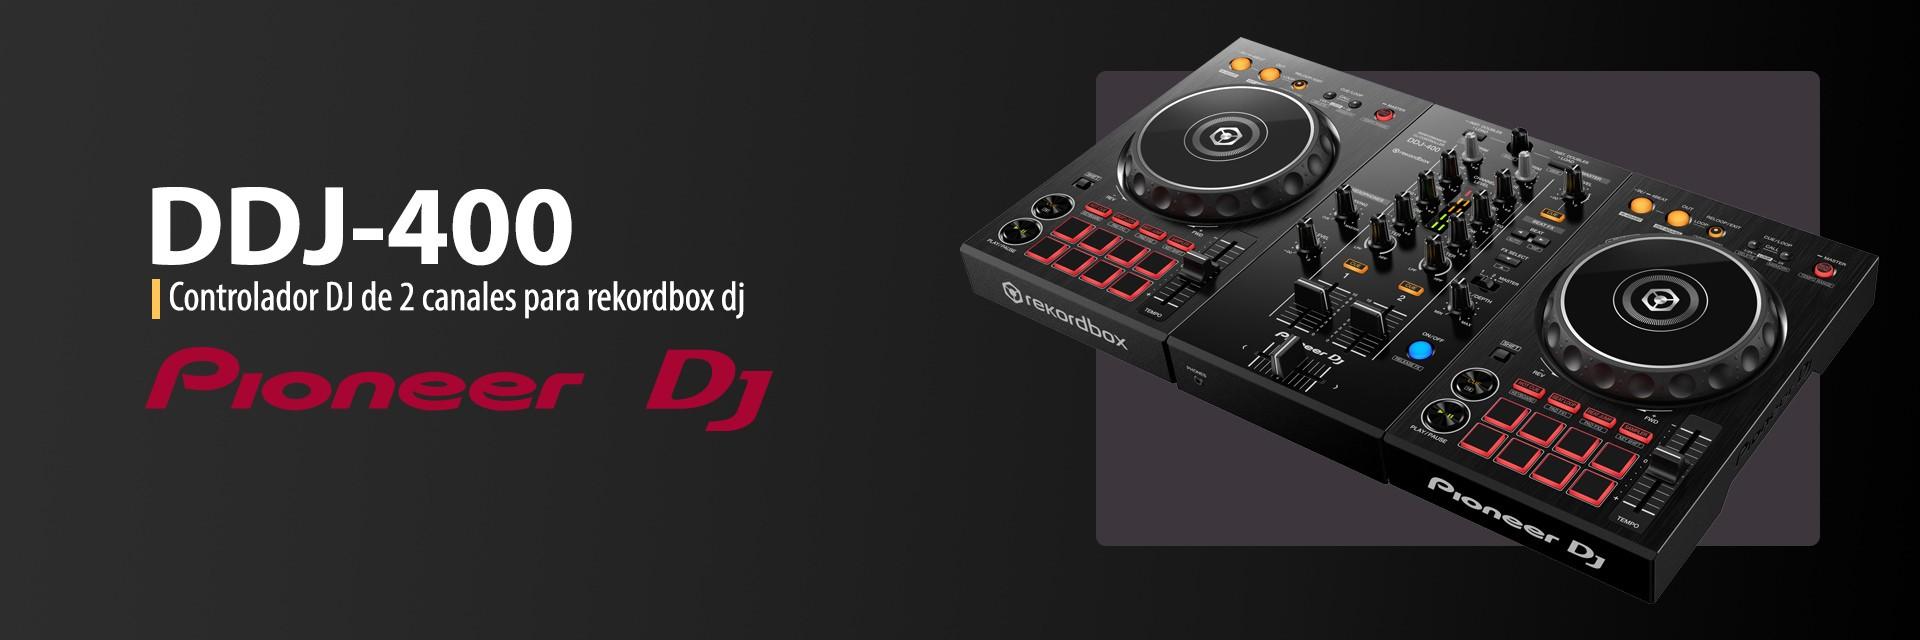 Controlador DJ de 2 canales para rekordbox dj Pioneer DJ DDJ-400